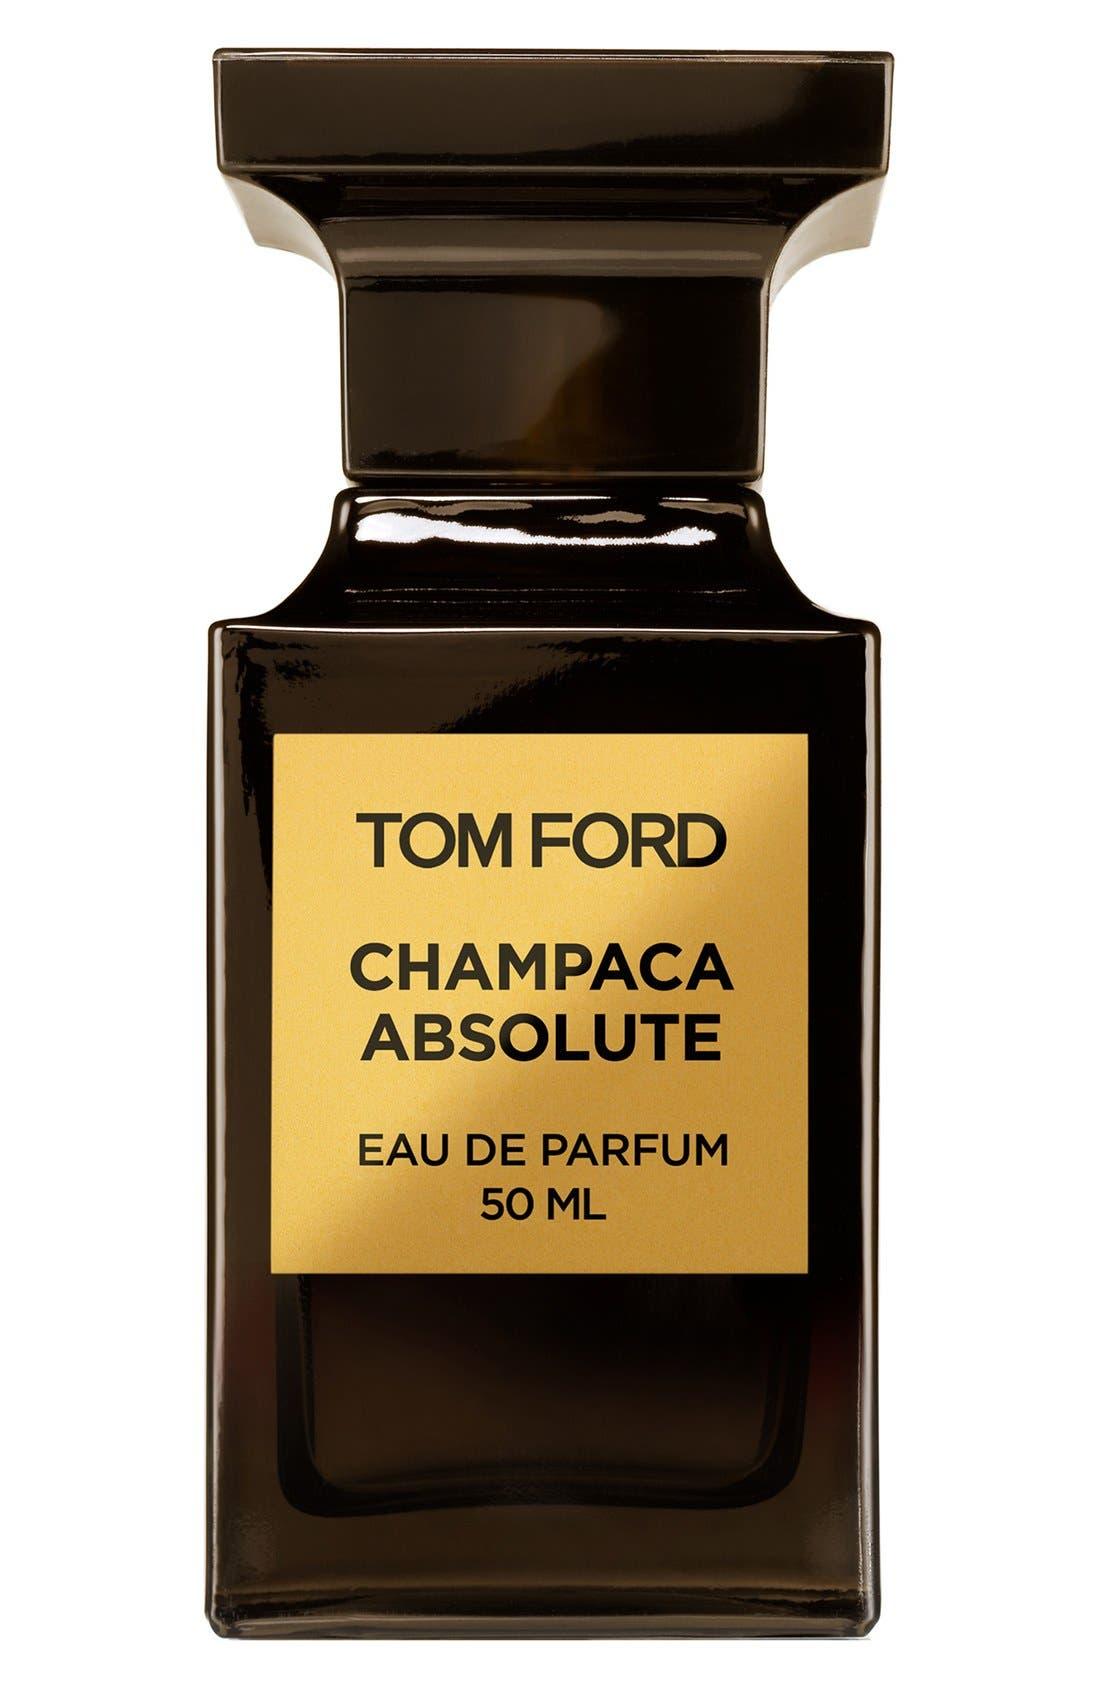 Tom Ford Private Blend Champaca Absolute Eau de Parfum